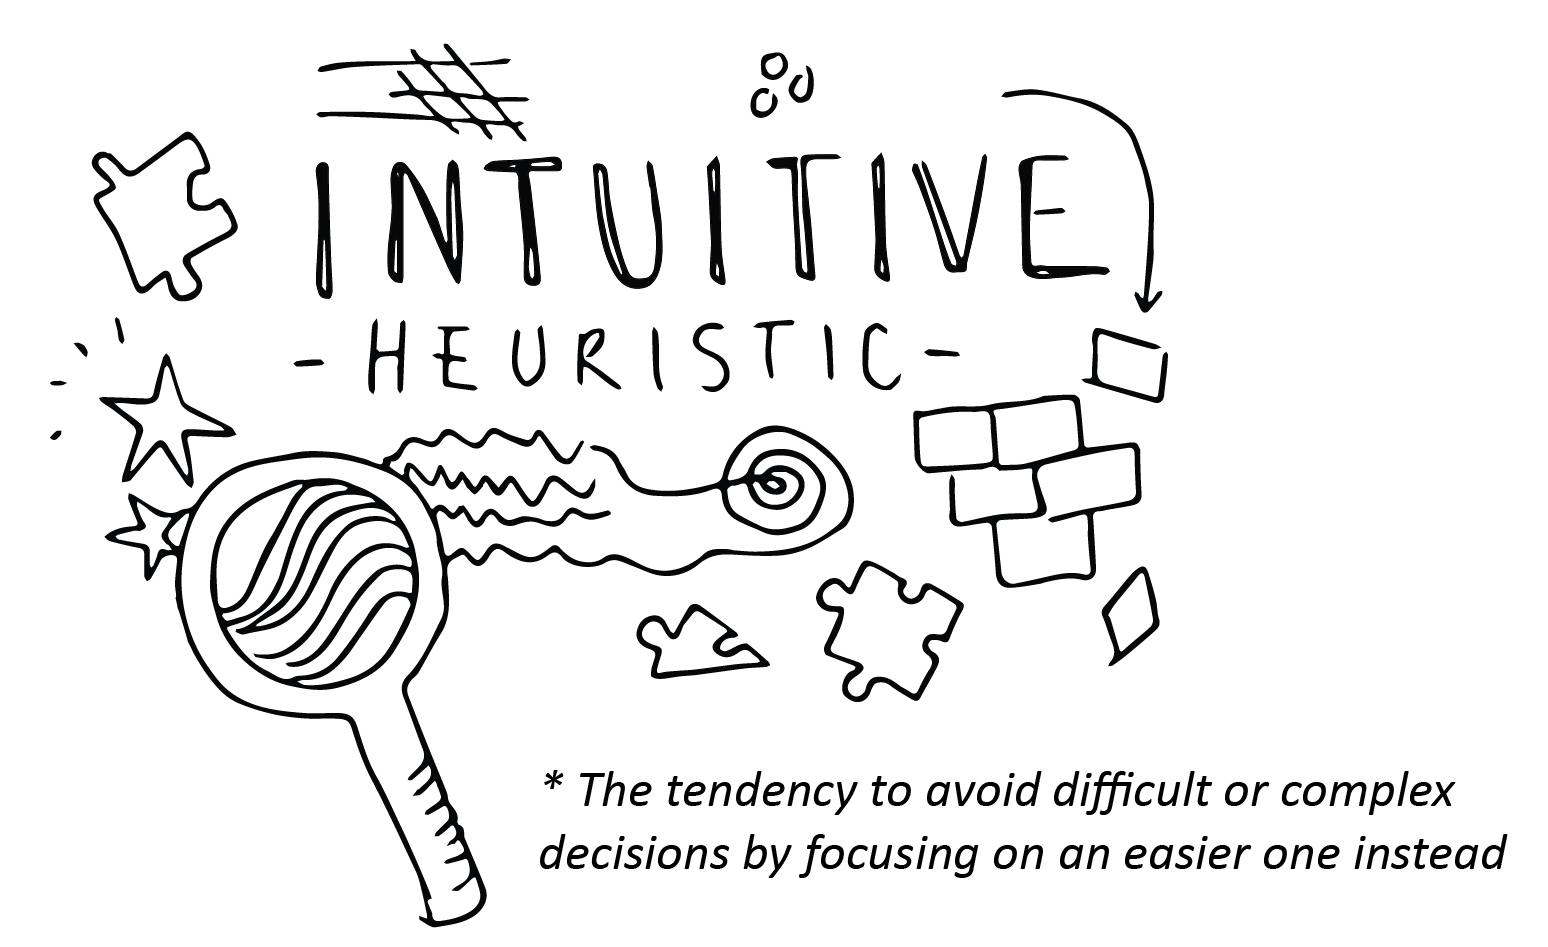 intuition-heuristic-mental health-dopeame.jpg